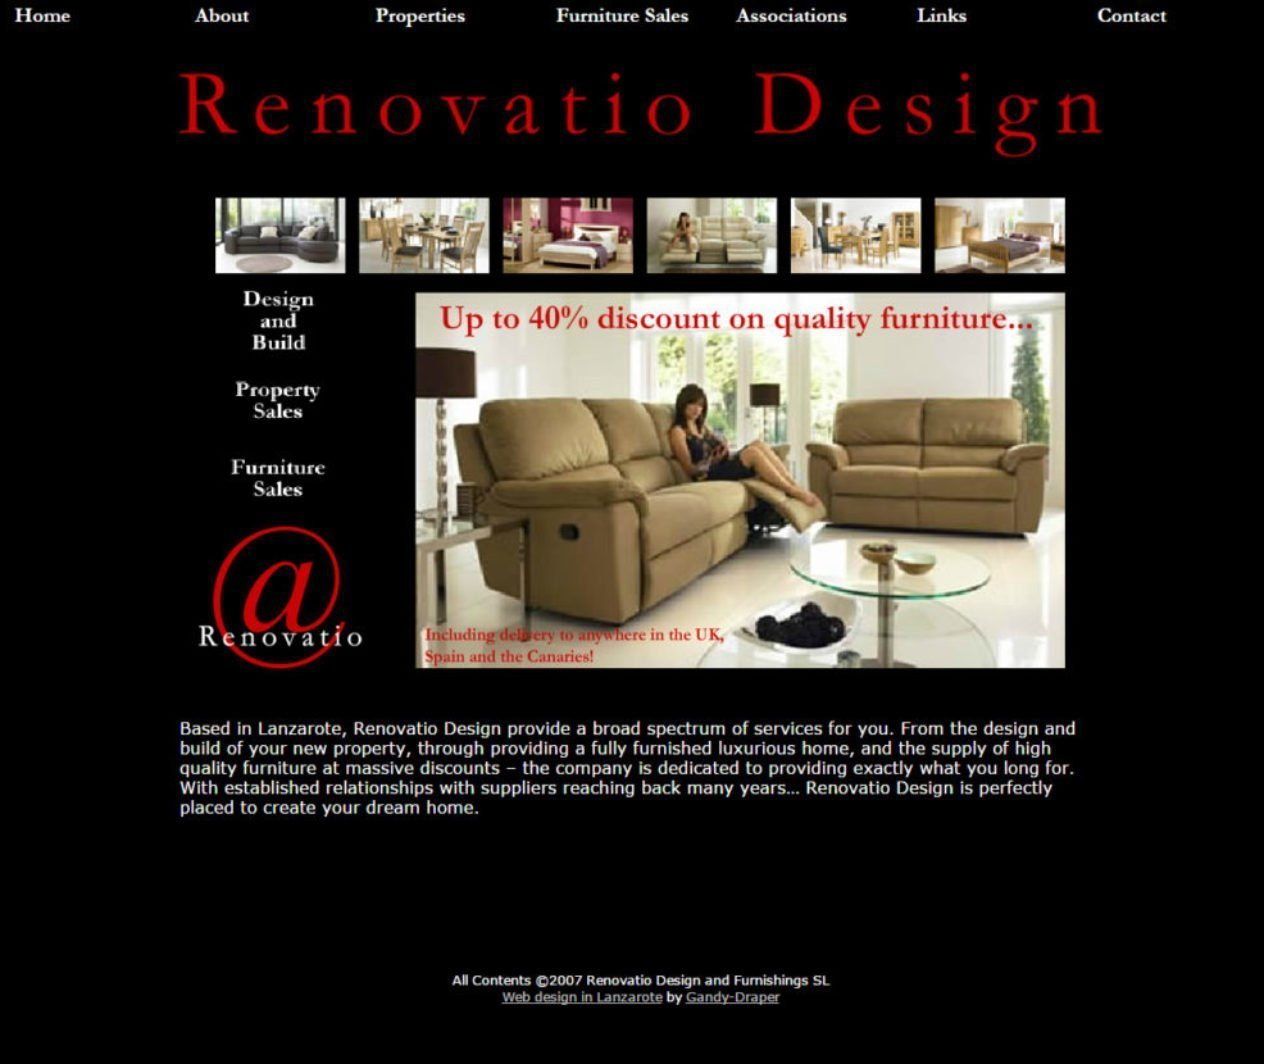 Renovatio Design